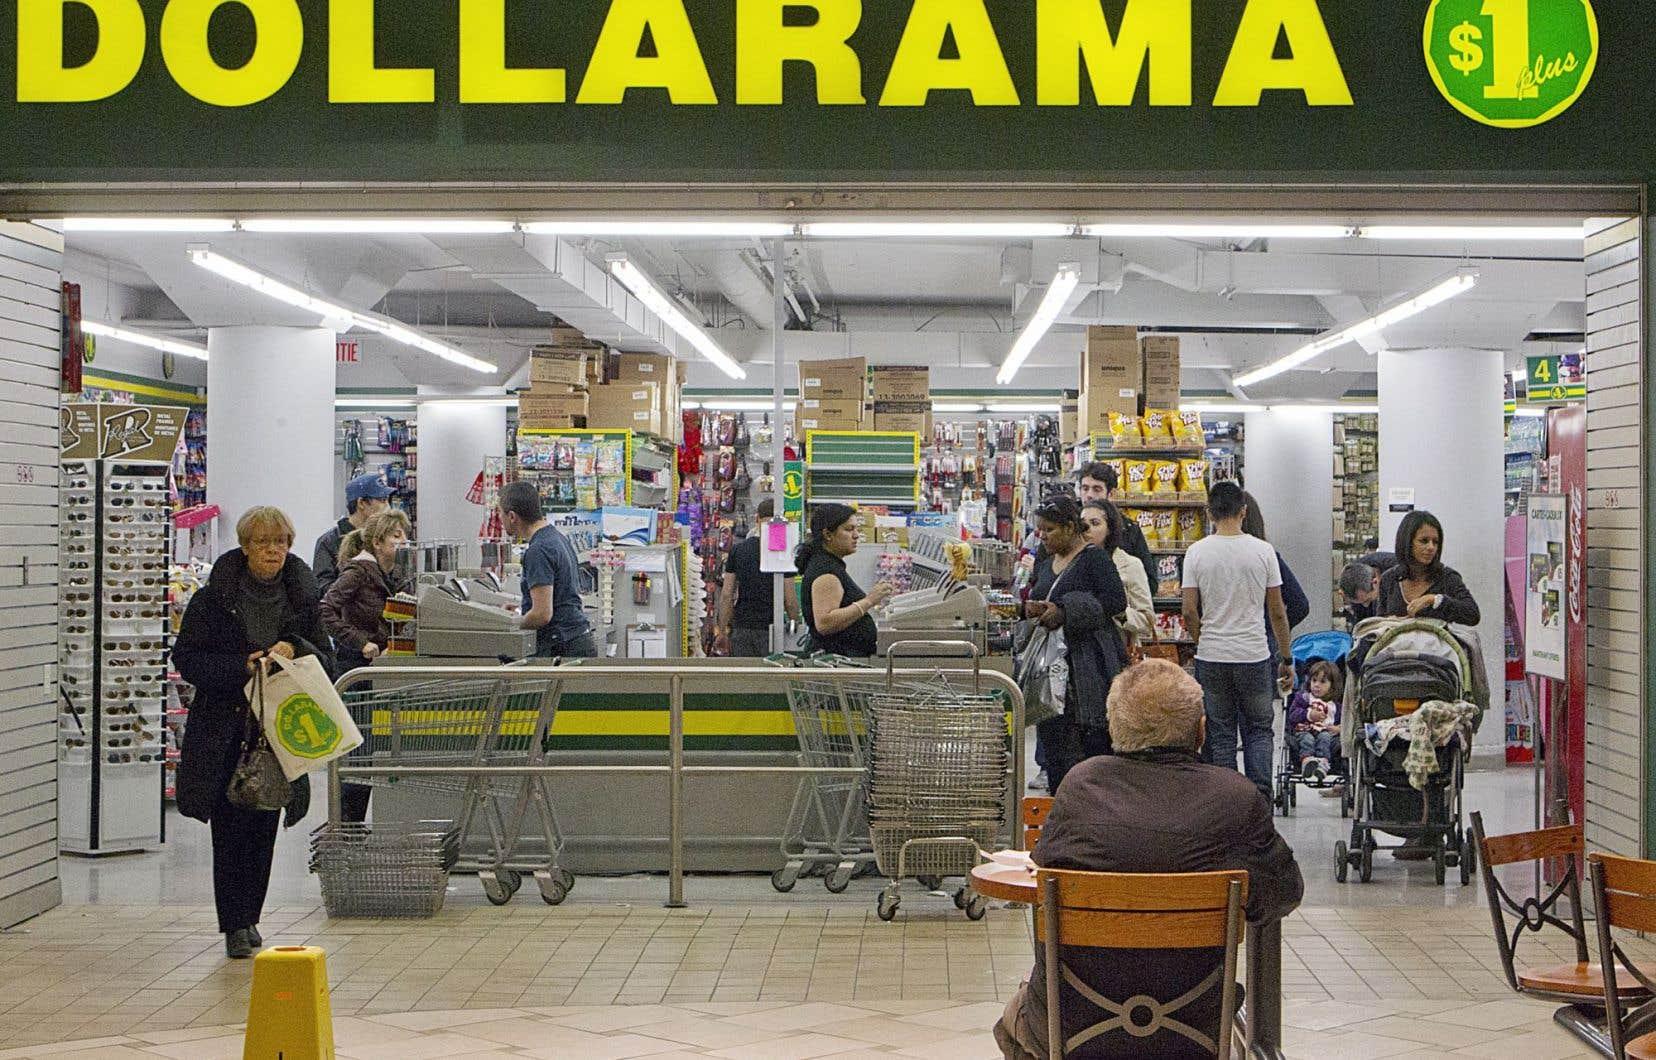 Dollarama exploite 1069 magasins au Canada.